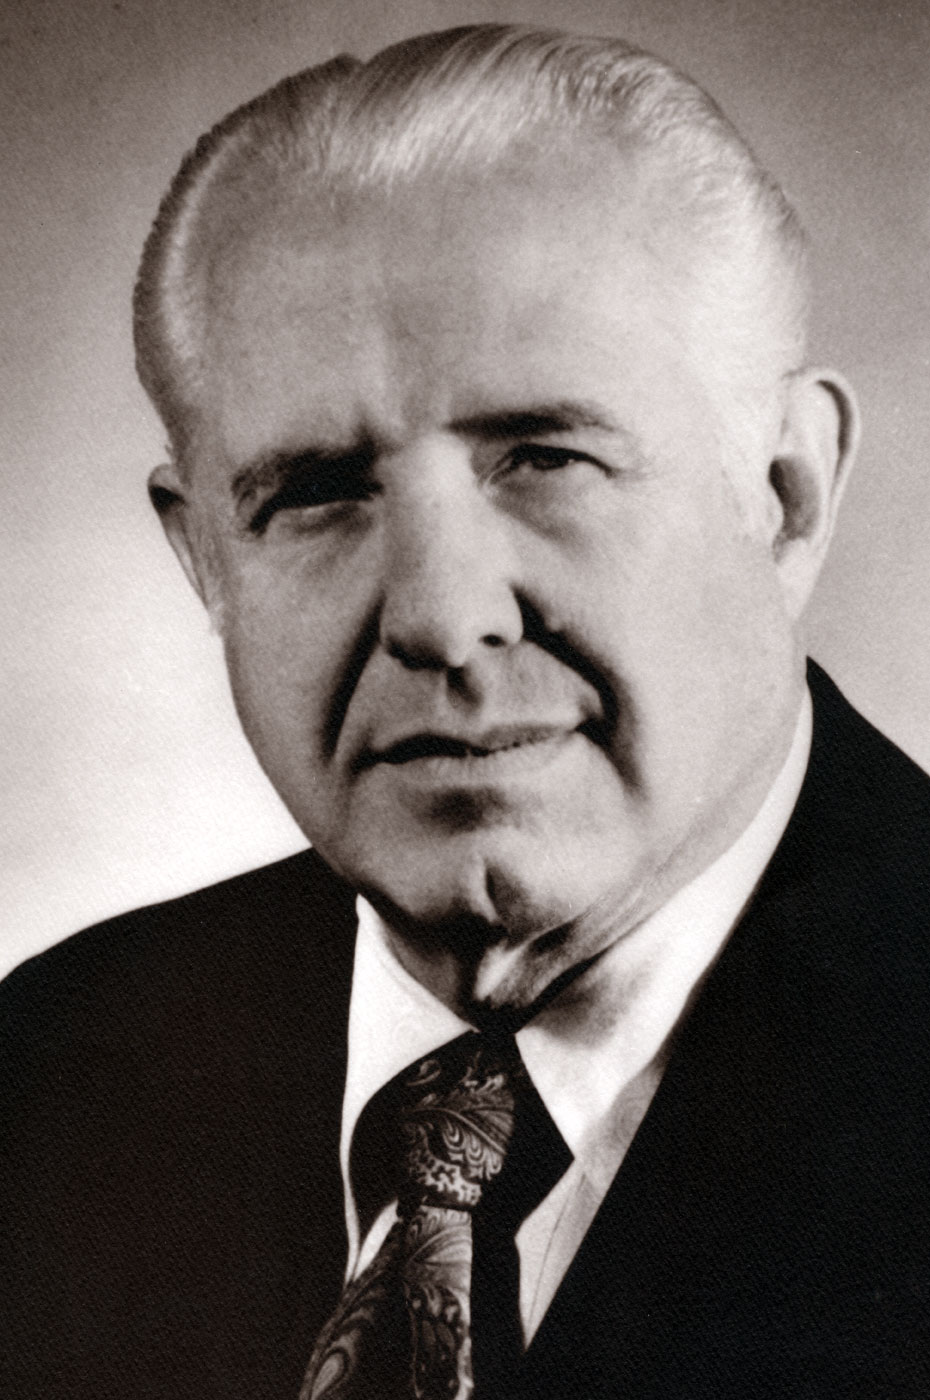 Duane W. Gagle